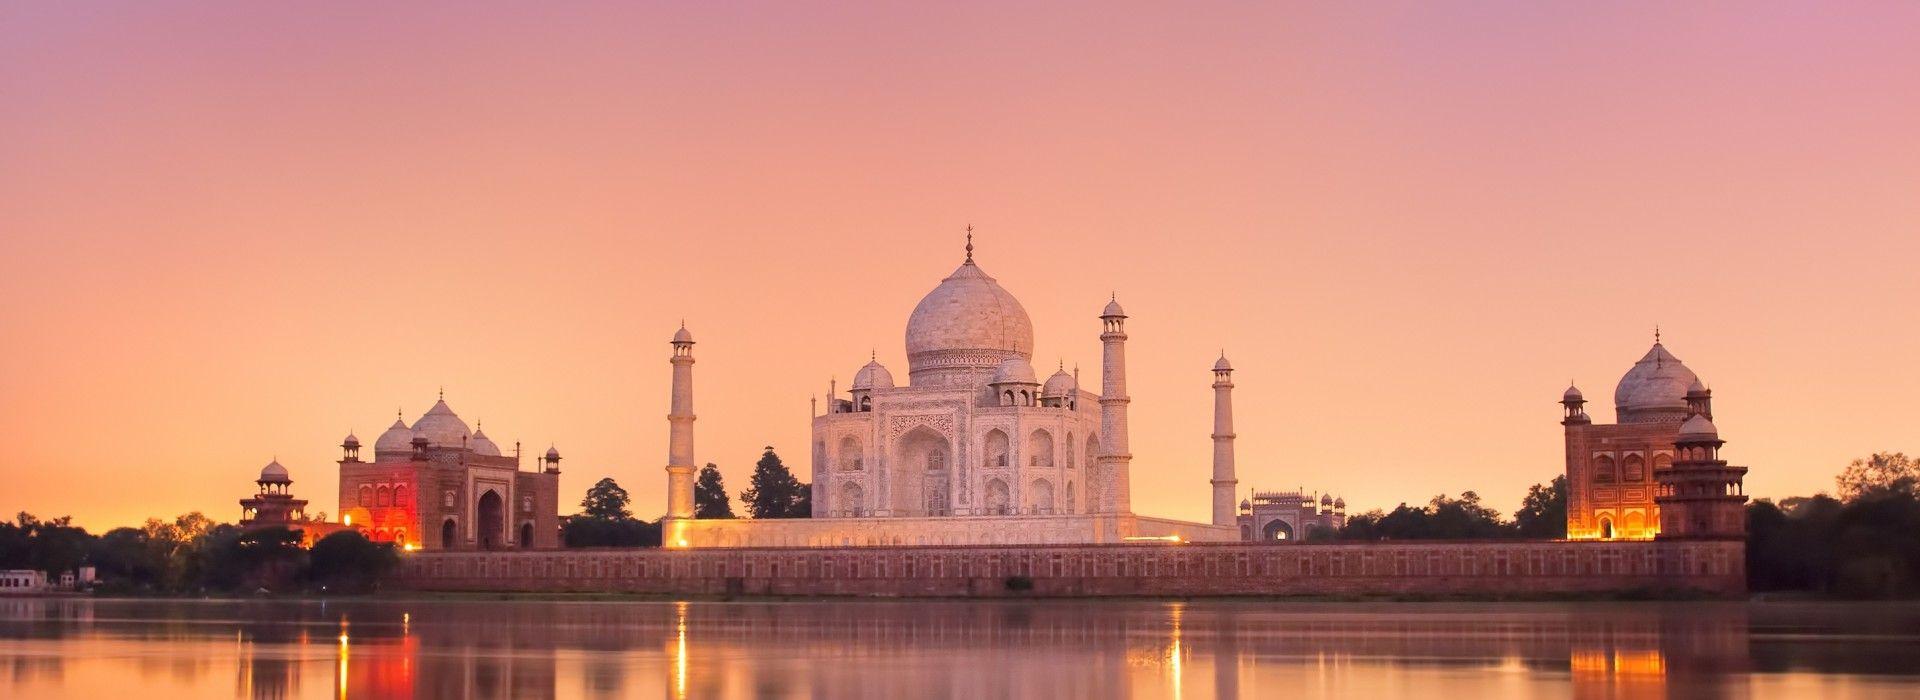 River cruise Tours in Delhi & Golden Triangle